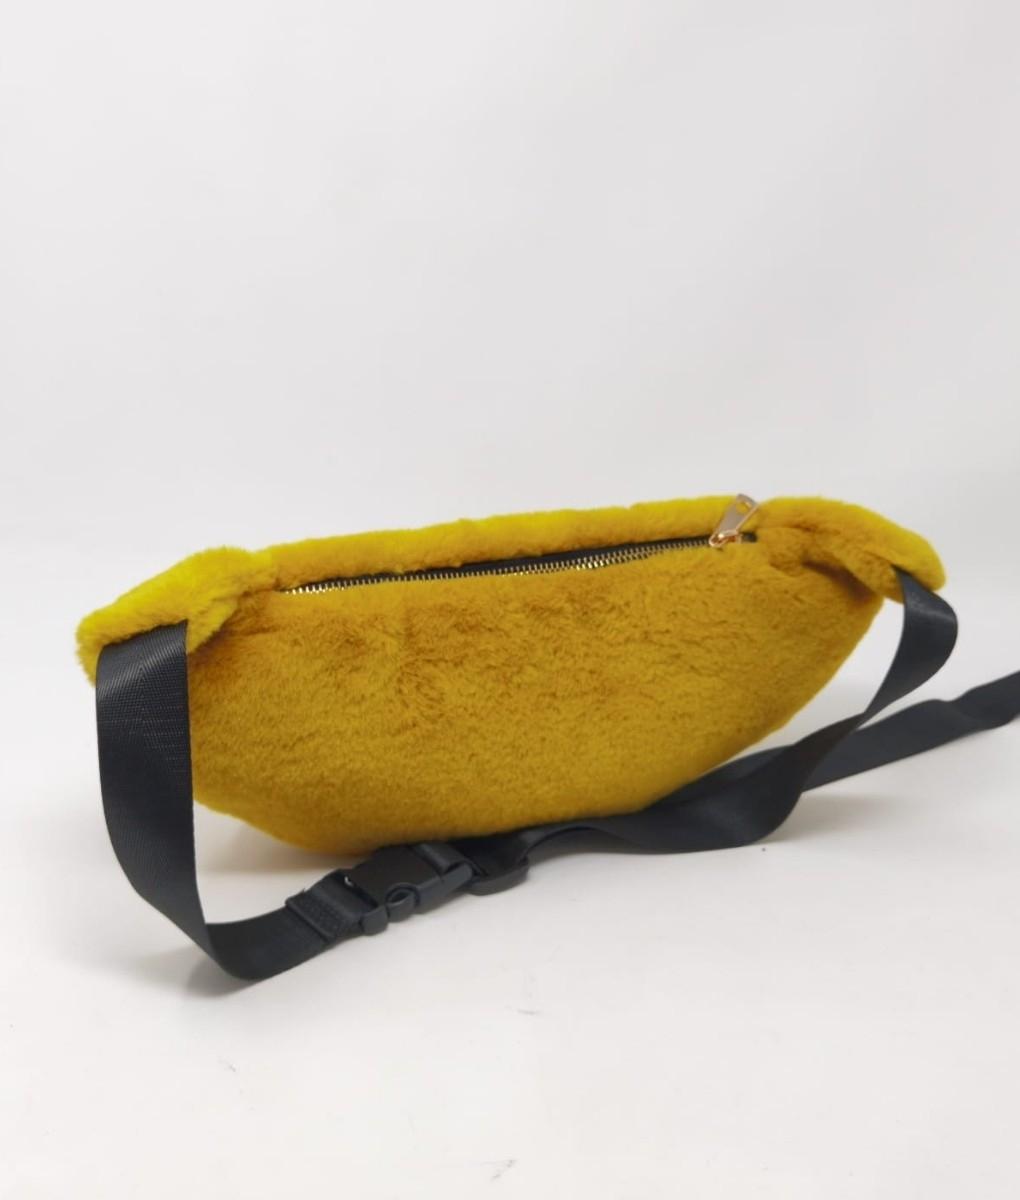 WAIST BAG GRY - YELLOW